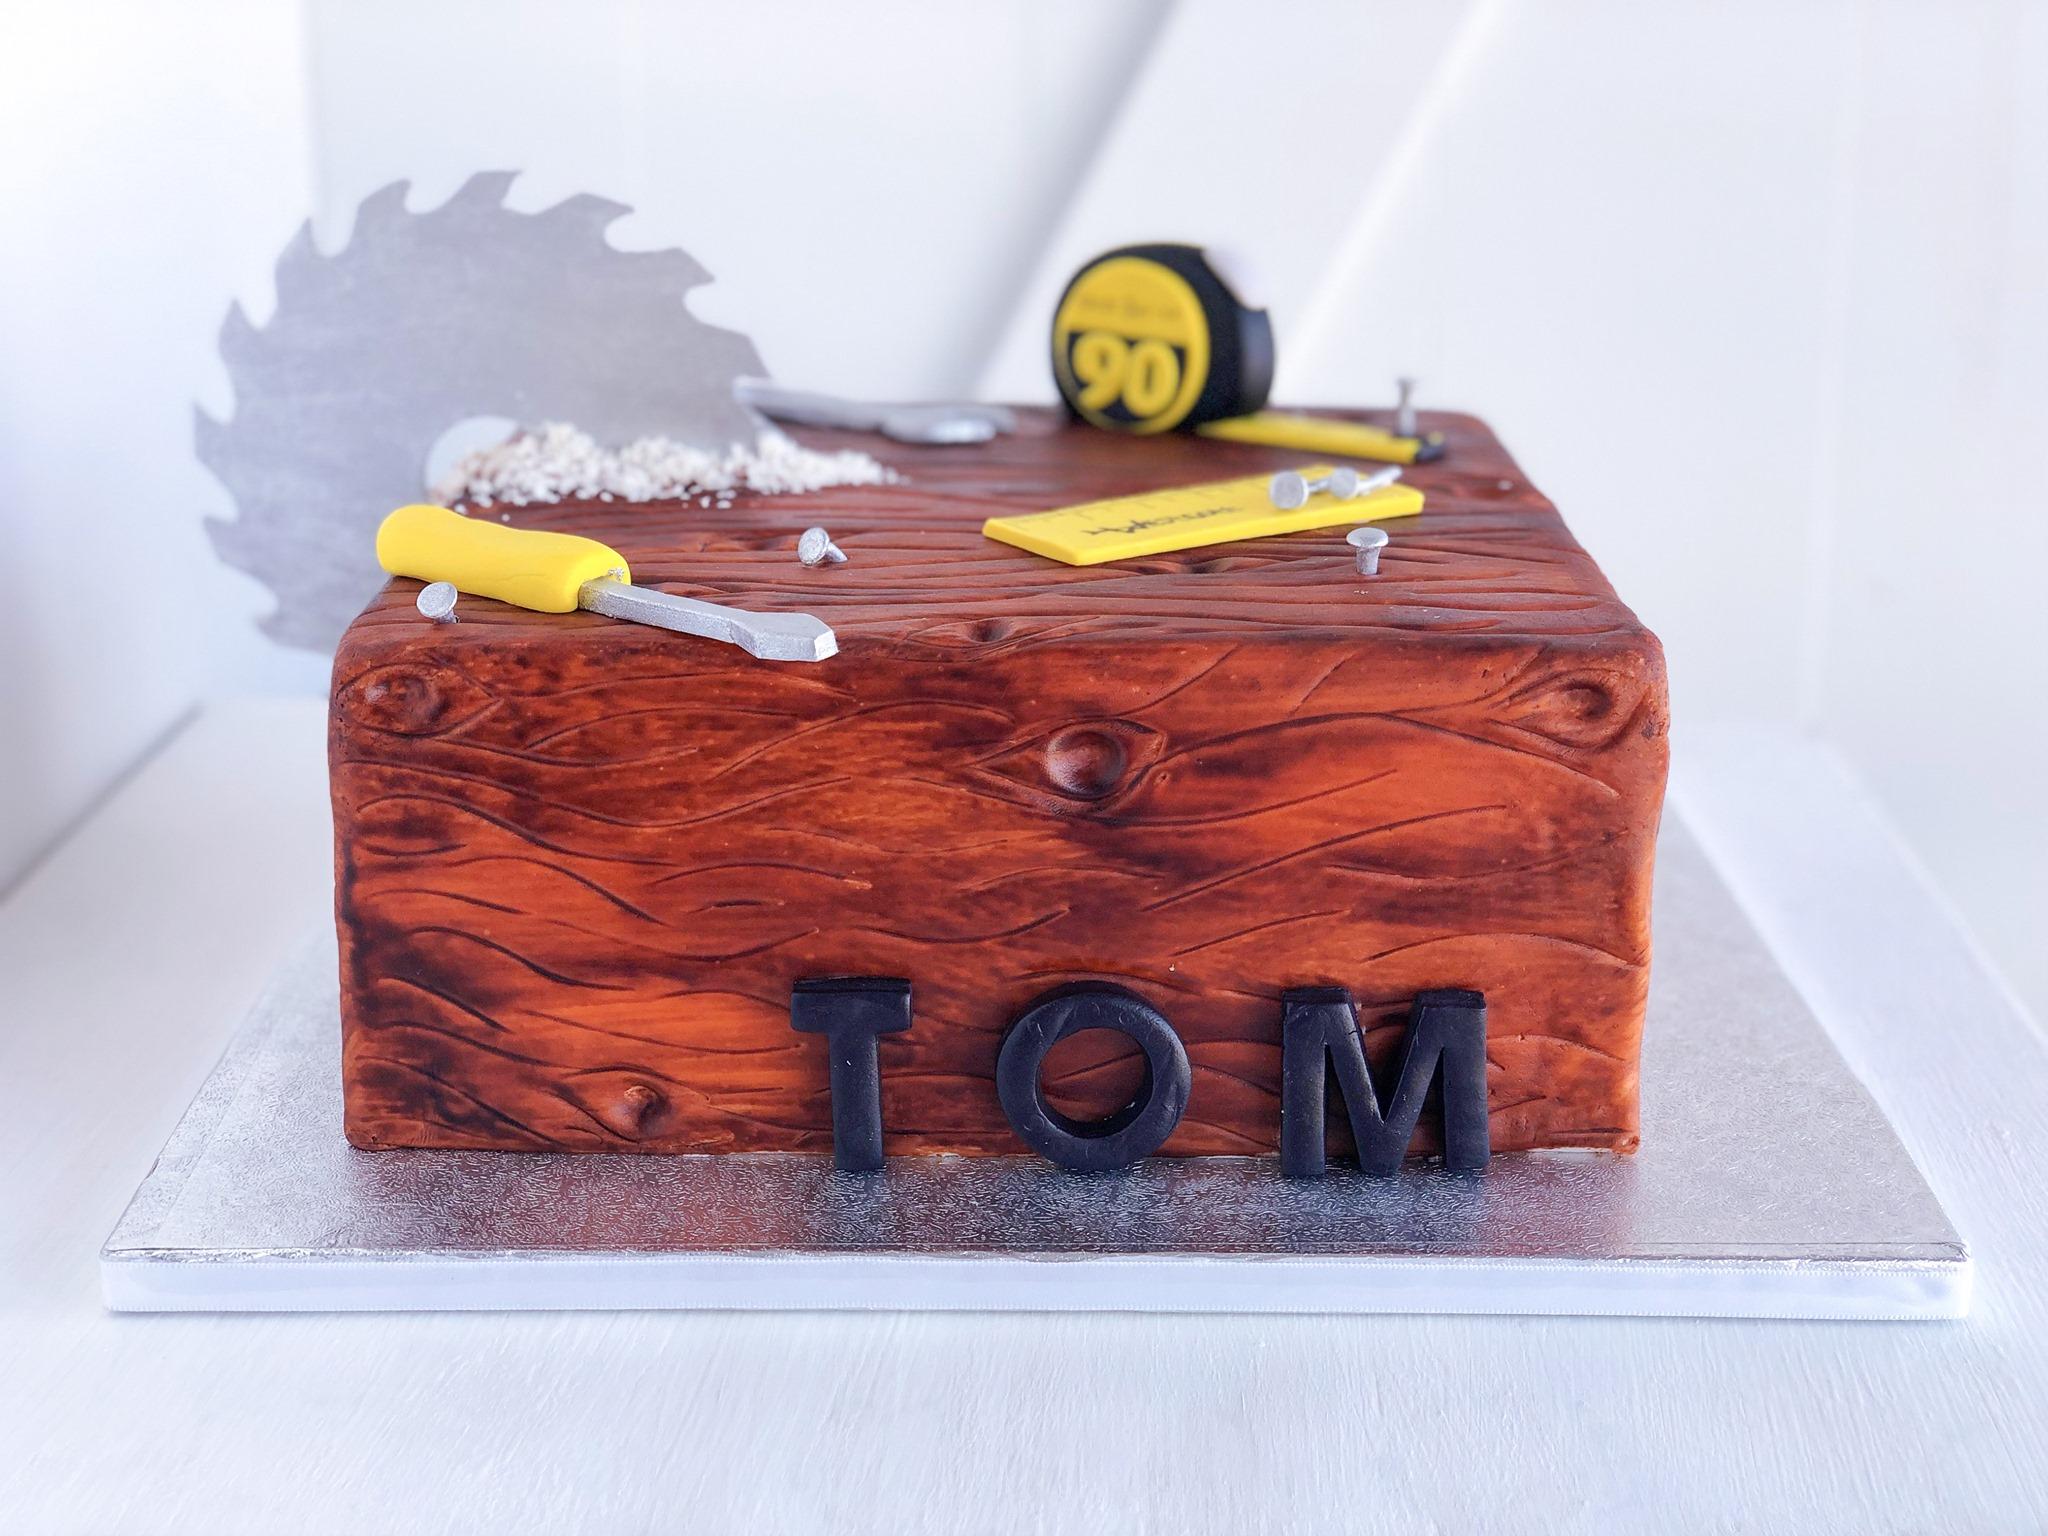 Tool Fondant Cake